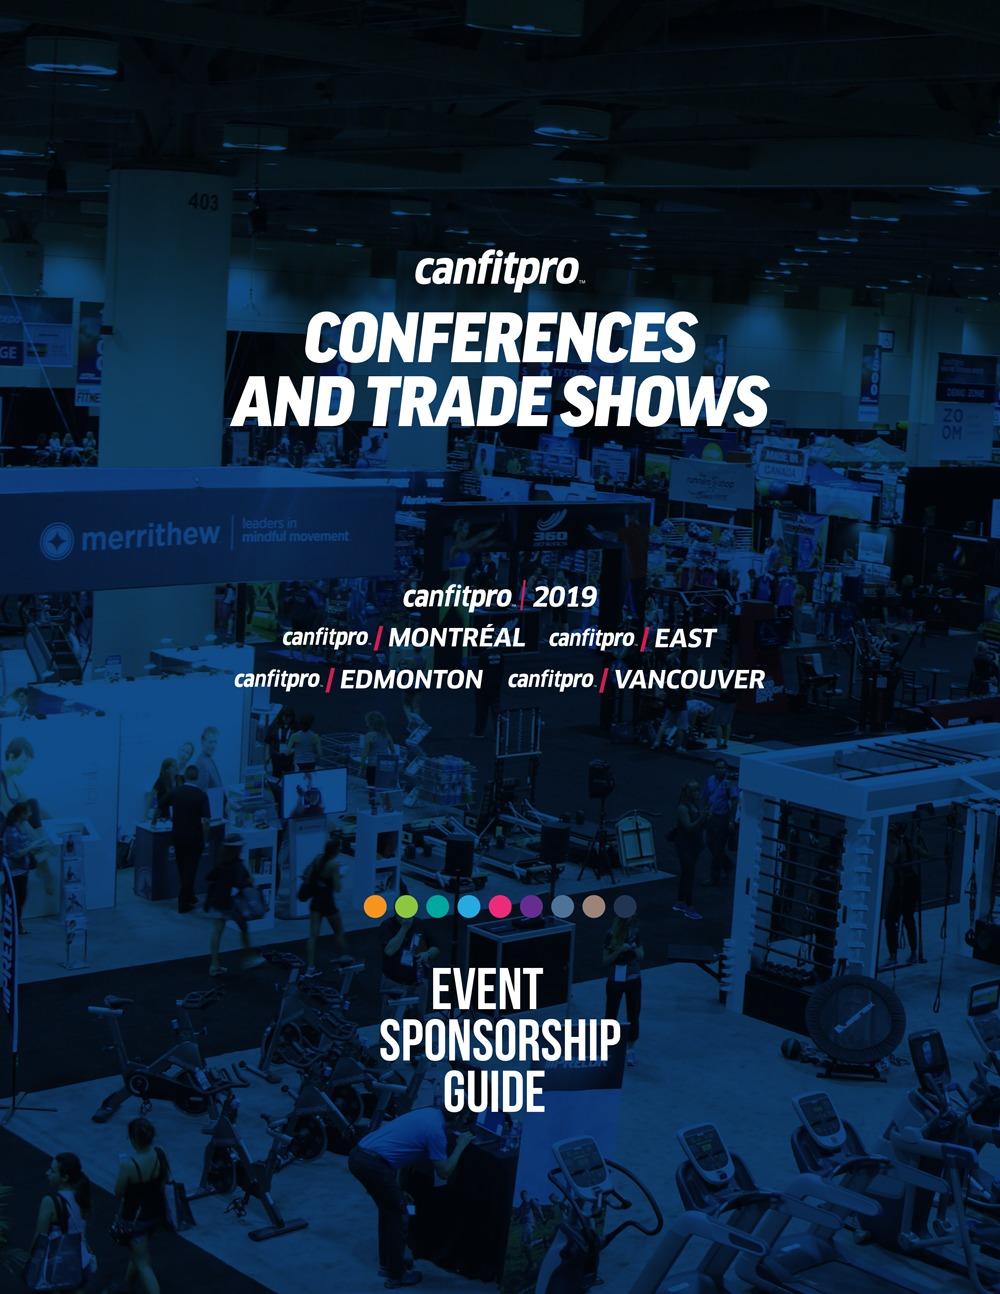 2019-Event-Sponsorship-Guide-s